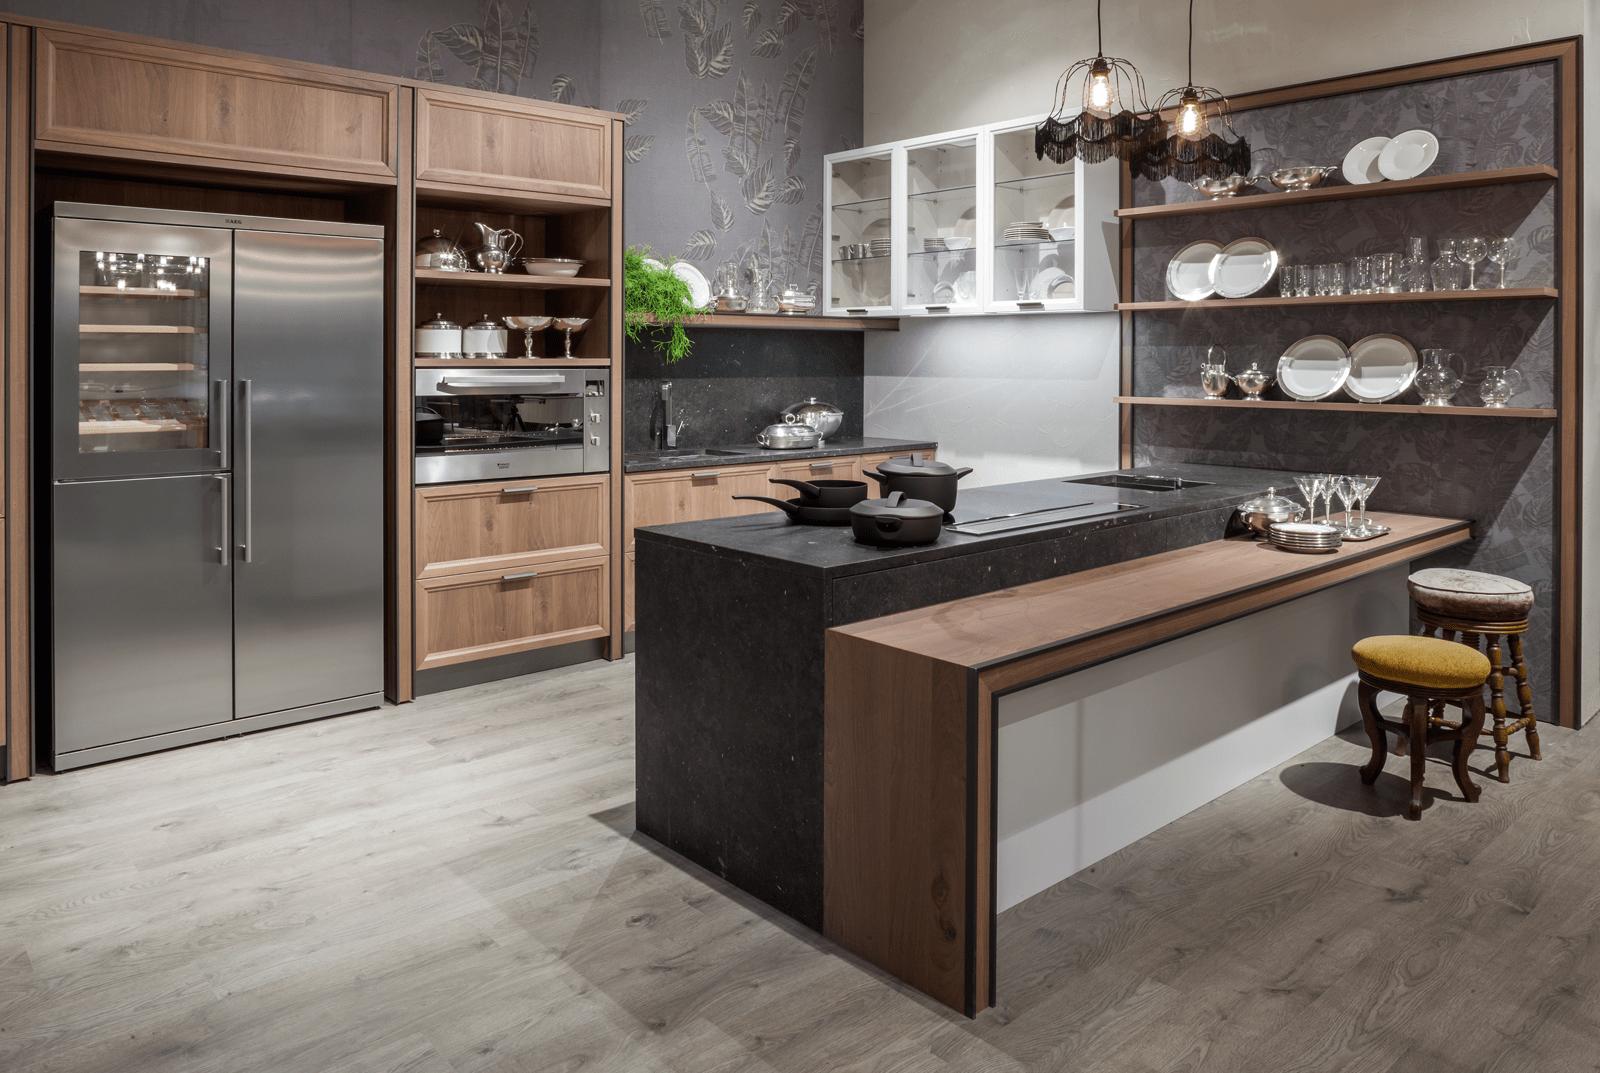 Boiserie attrezzate per le cucine cose di casa for Cucine immagini